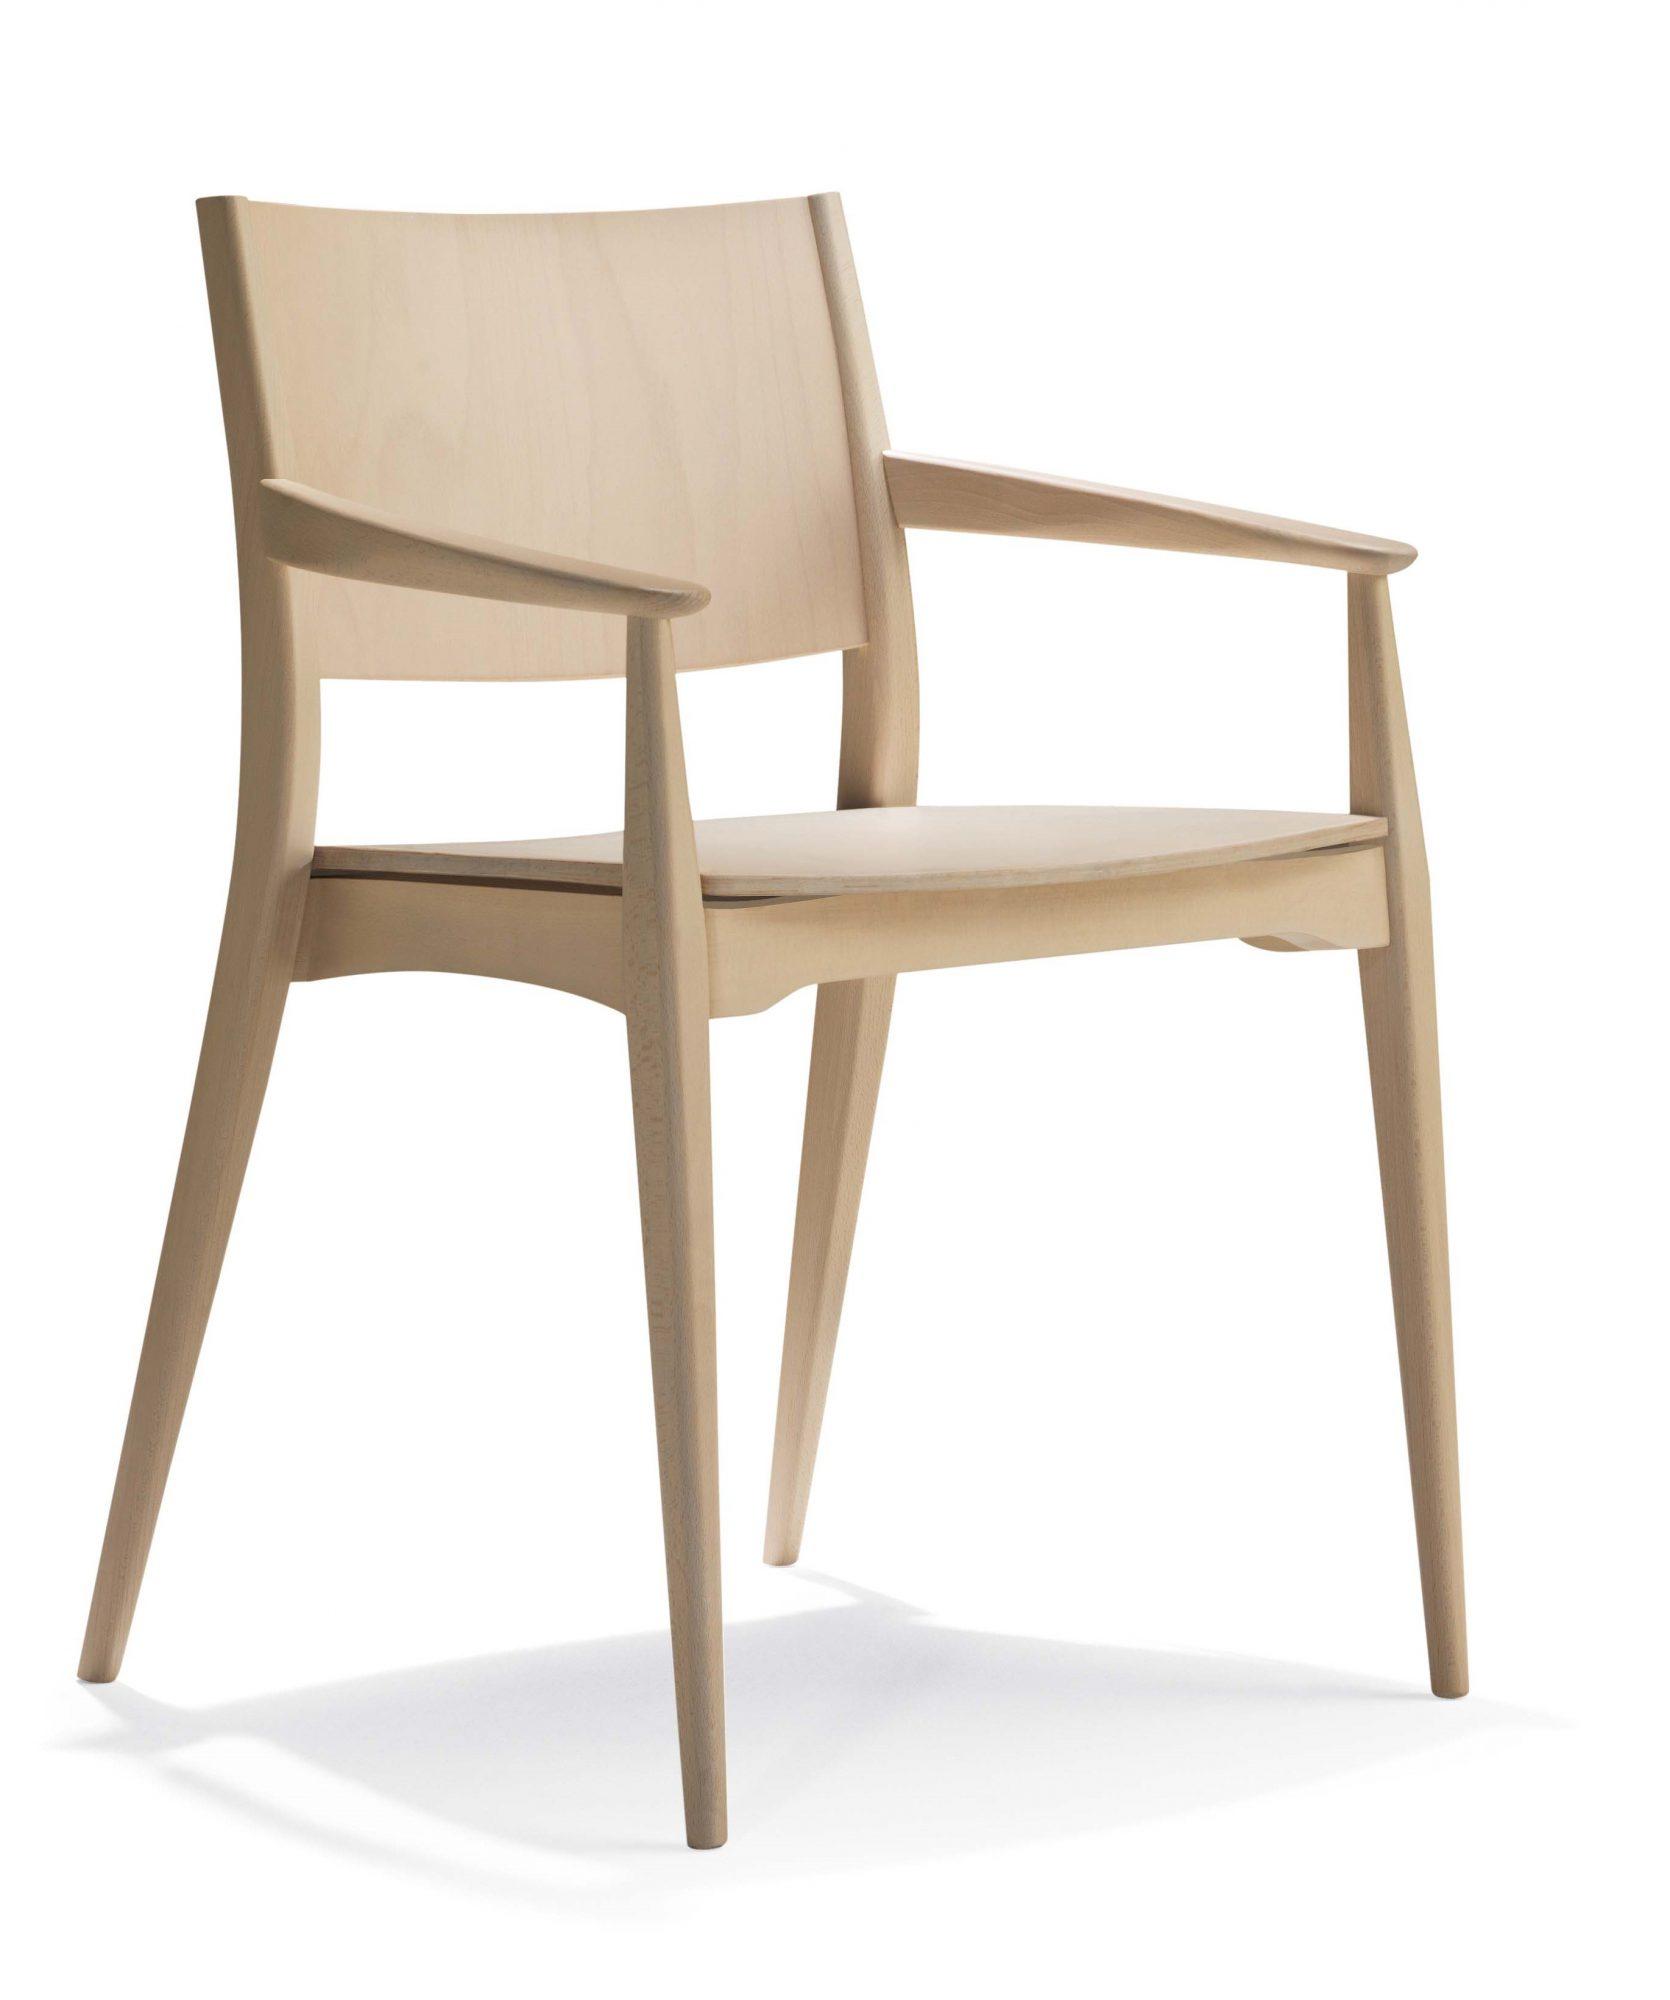 Blazer armchair upholstered telegraph contract furniture for Furniture upholsterer